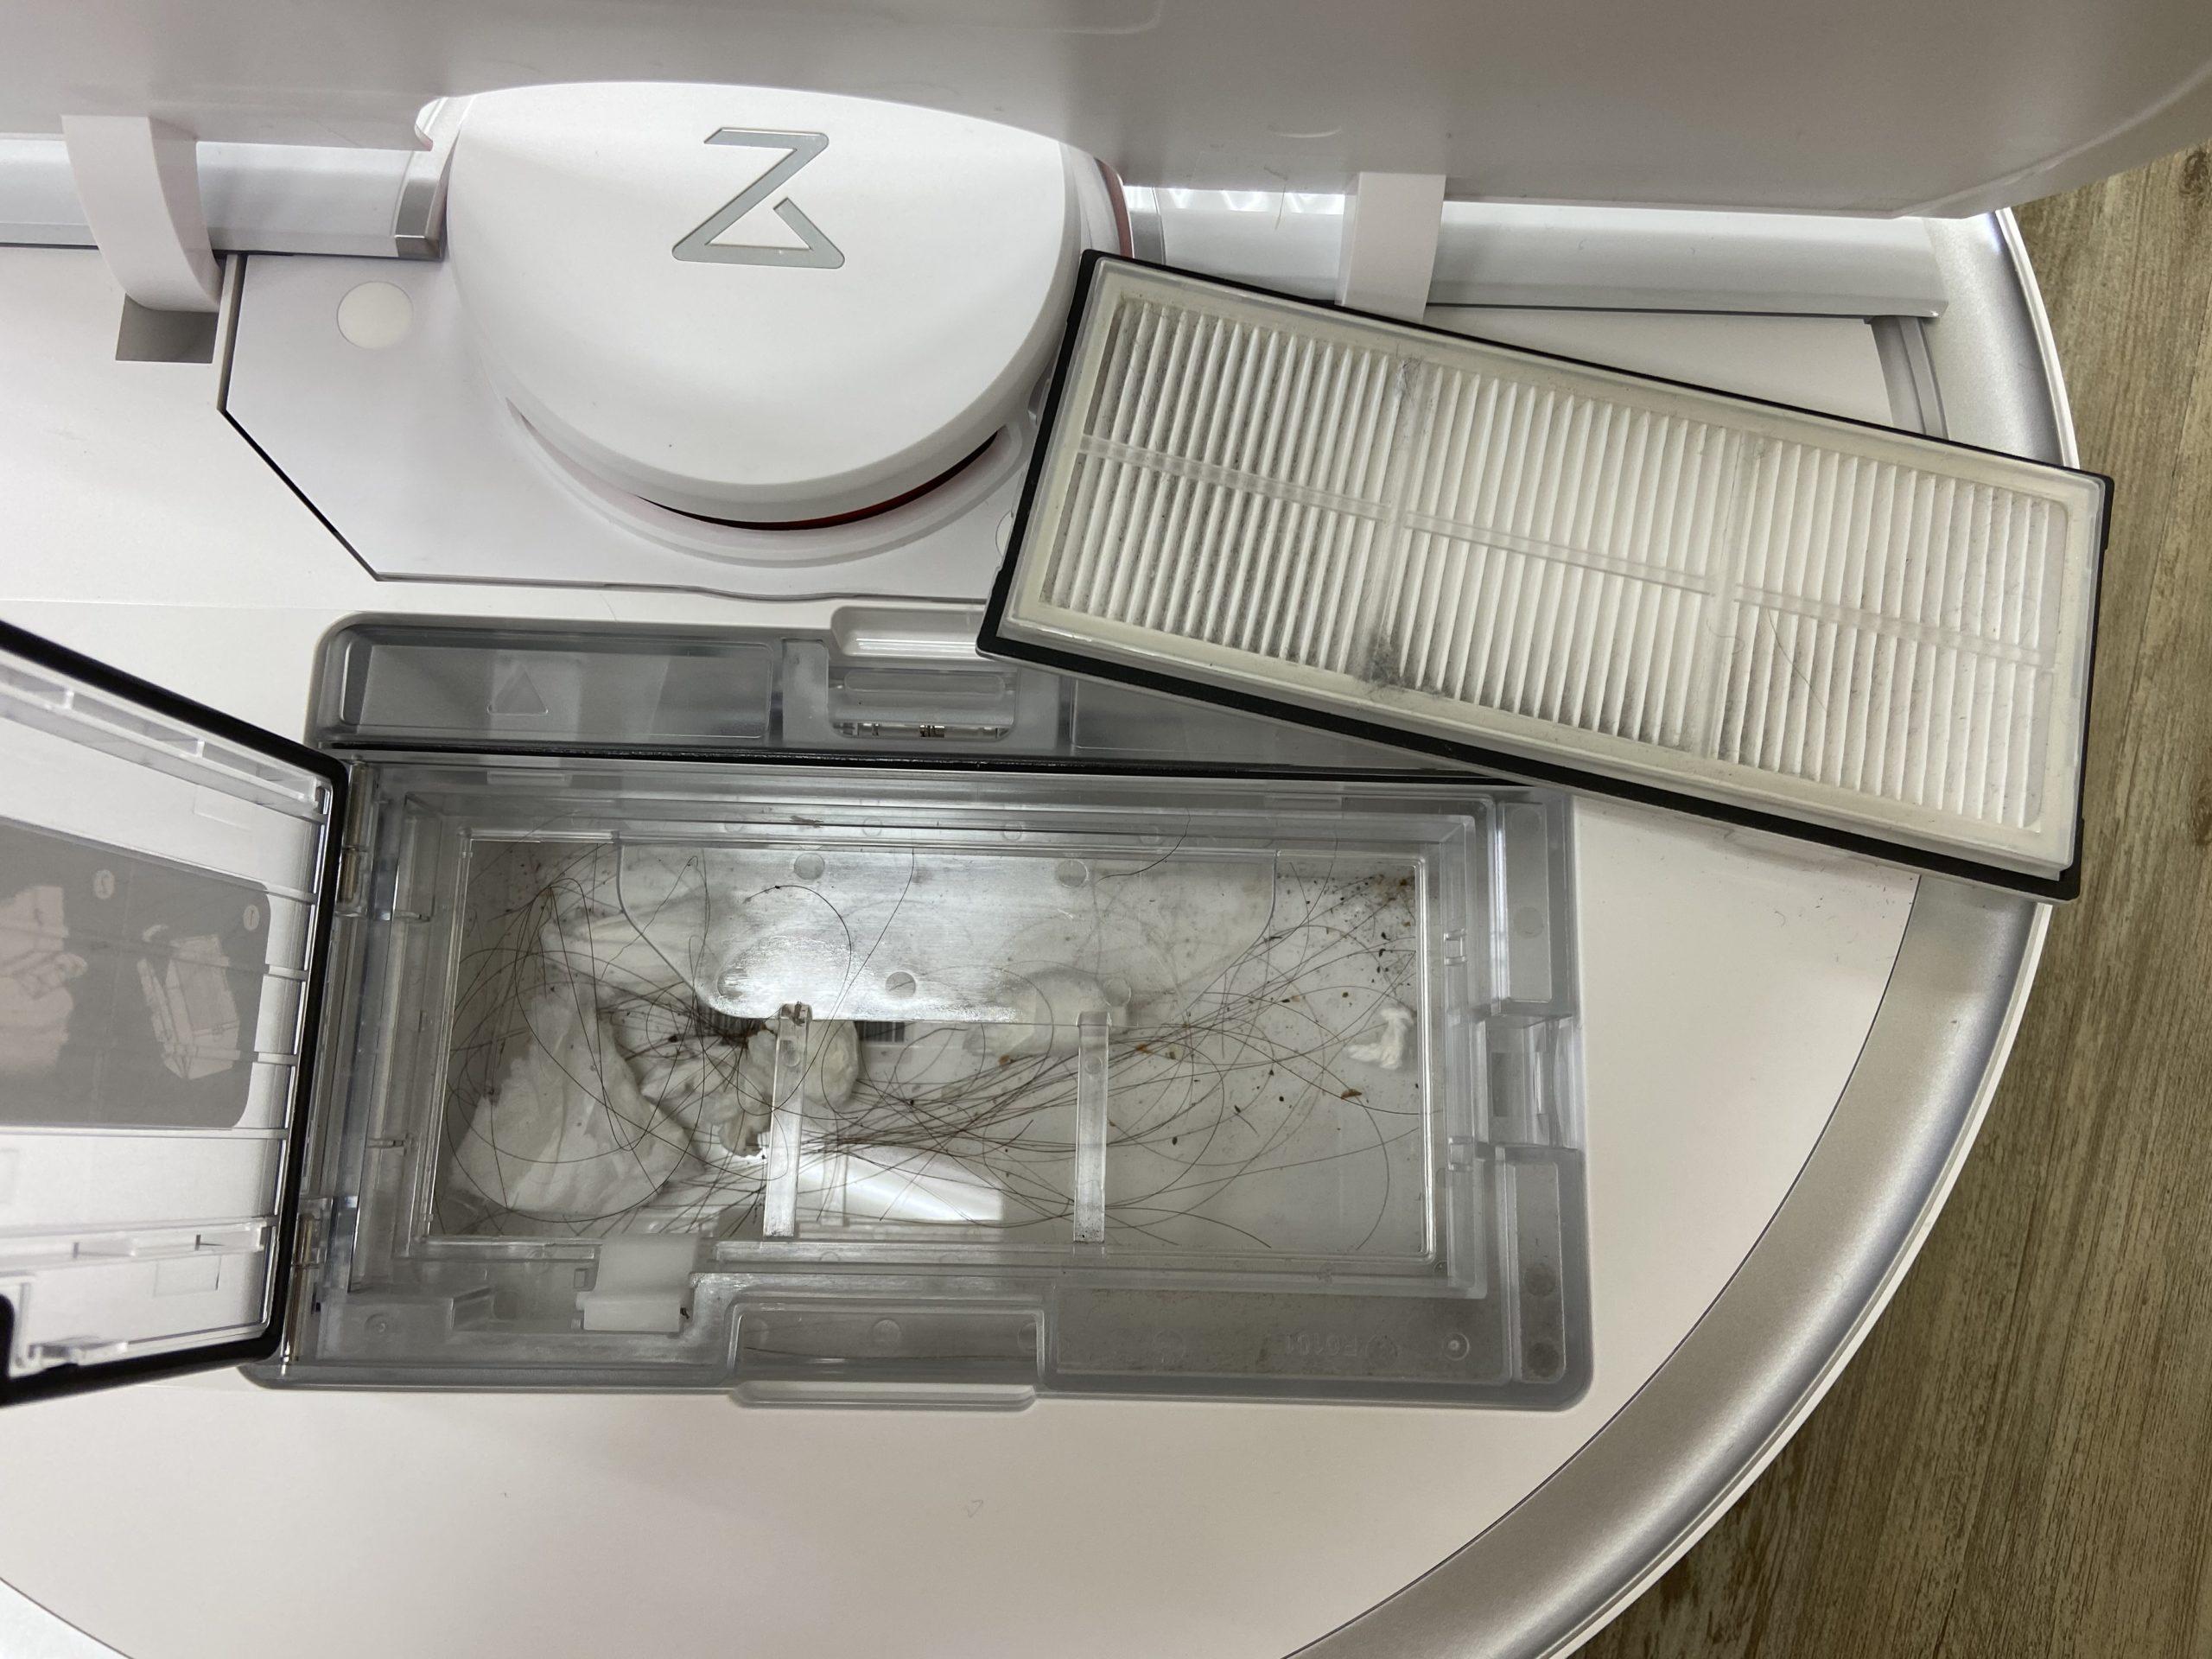 Roborock S7 石頭掃拖機器人 實測塵盒